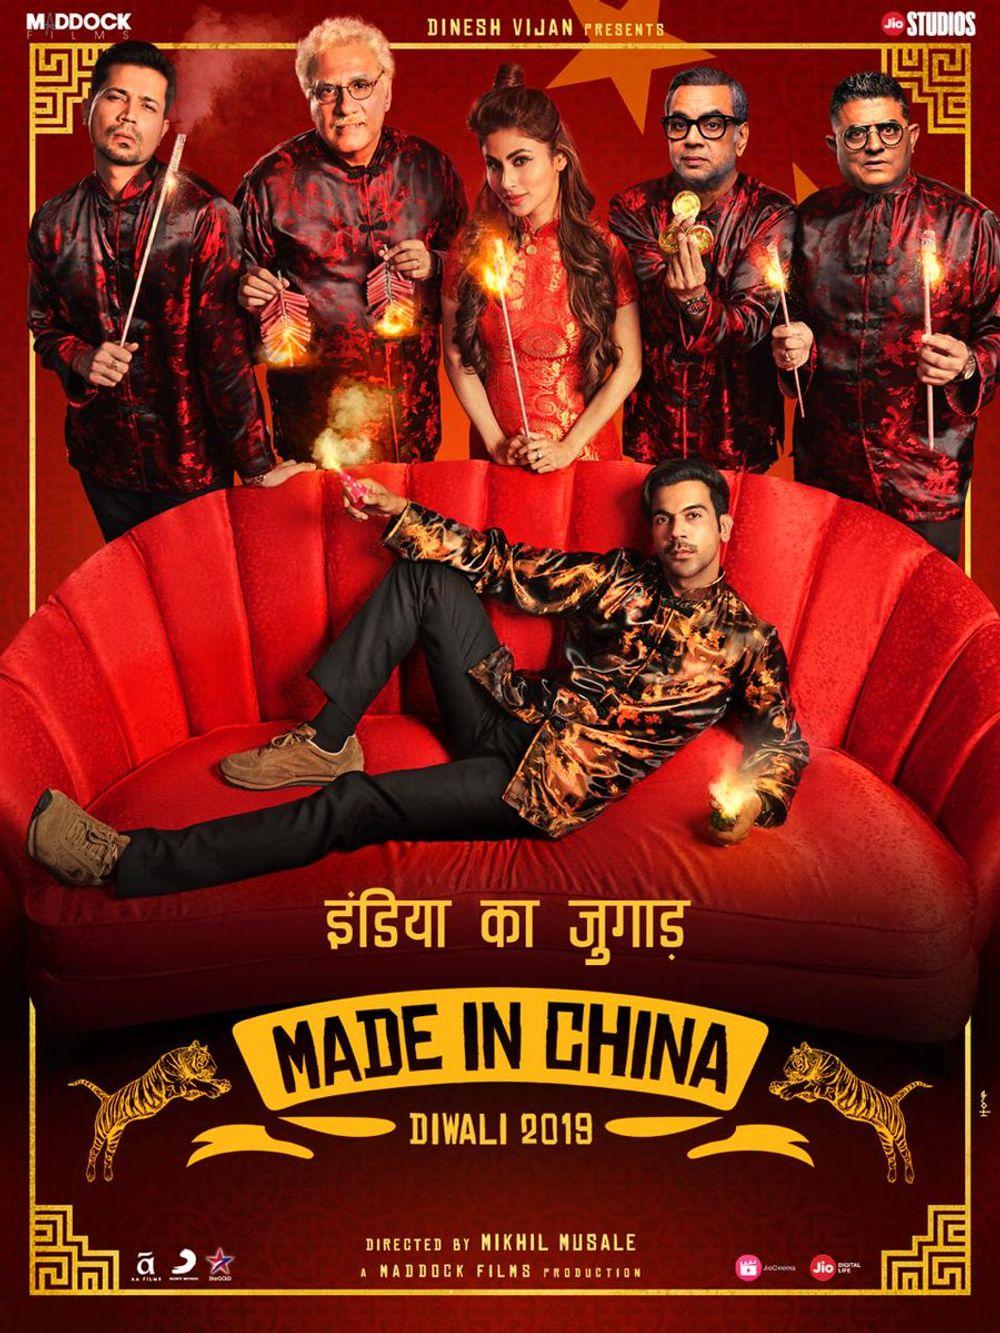 Made In China (2019) HQ Hindi PRE-DVD 720p 480p x264 | Full Movie